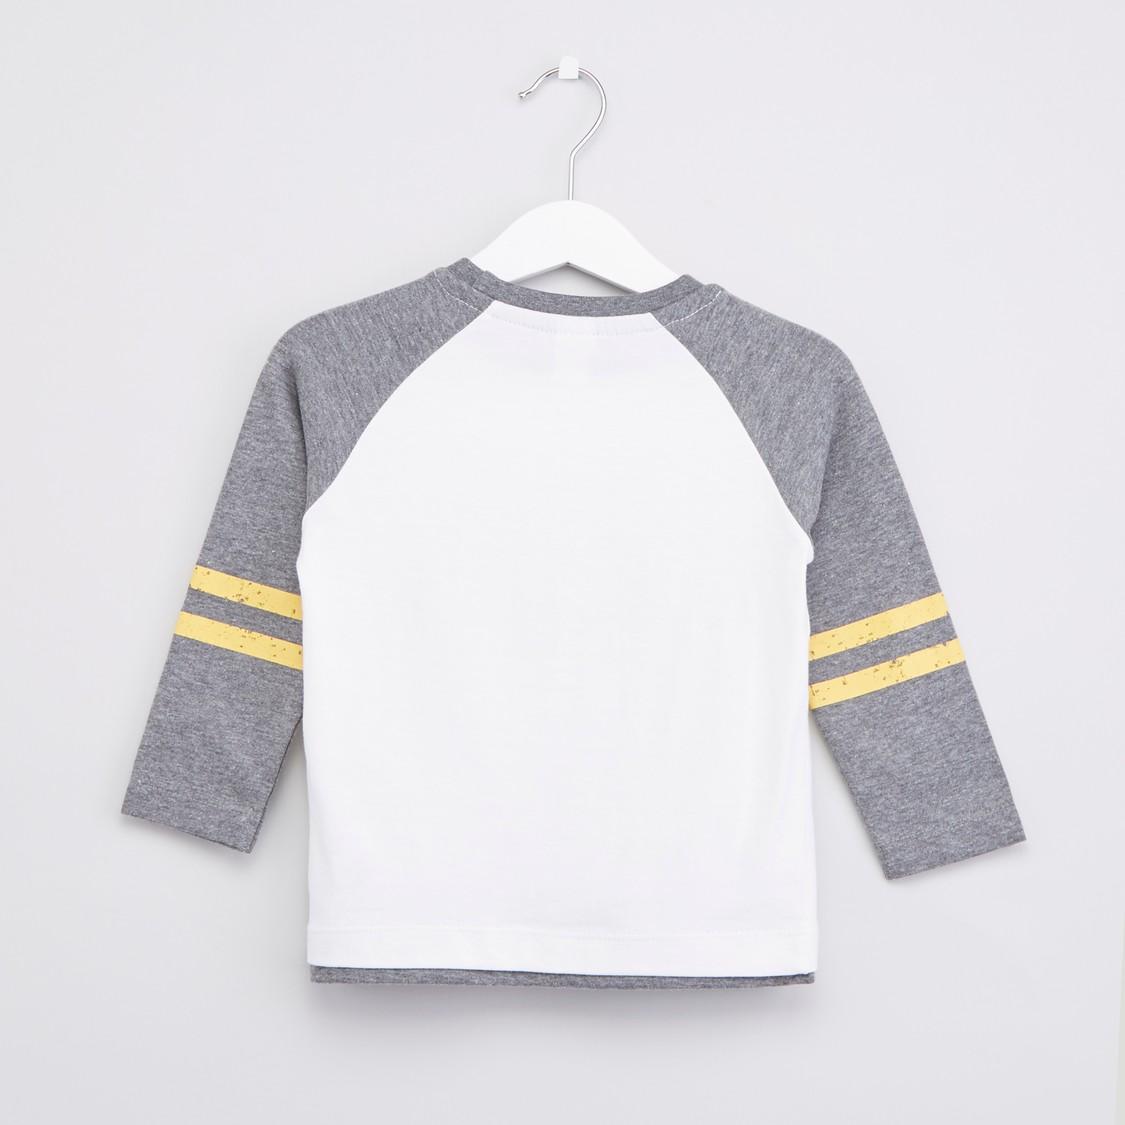 Printed T-shirt and Joggers with Drawstring Closure